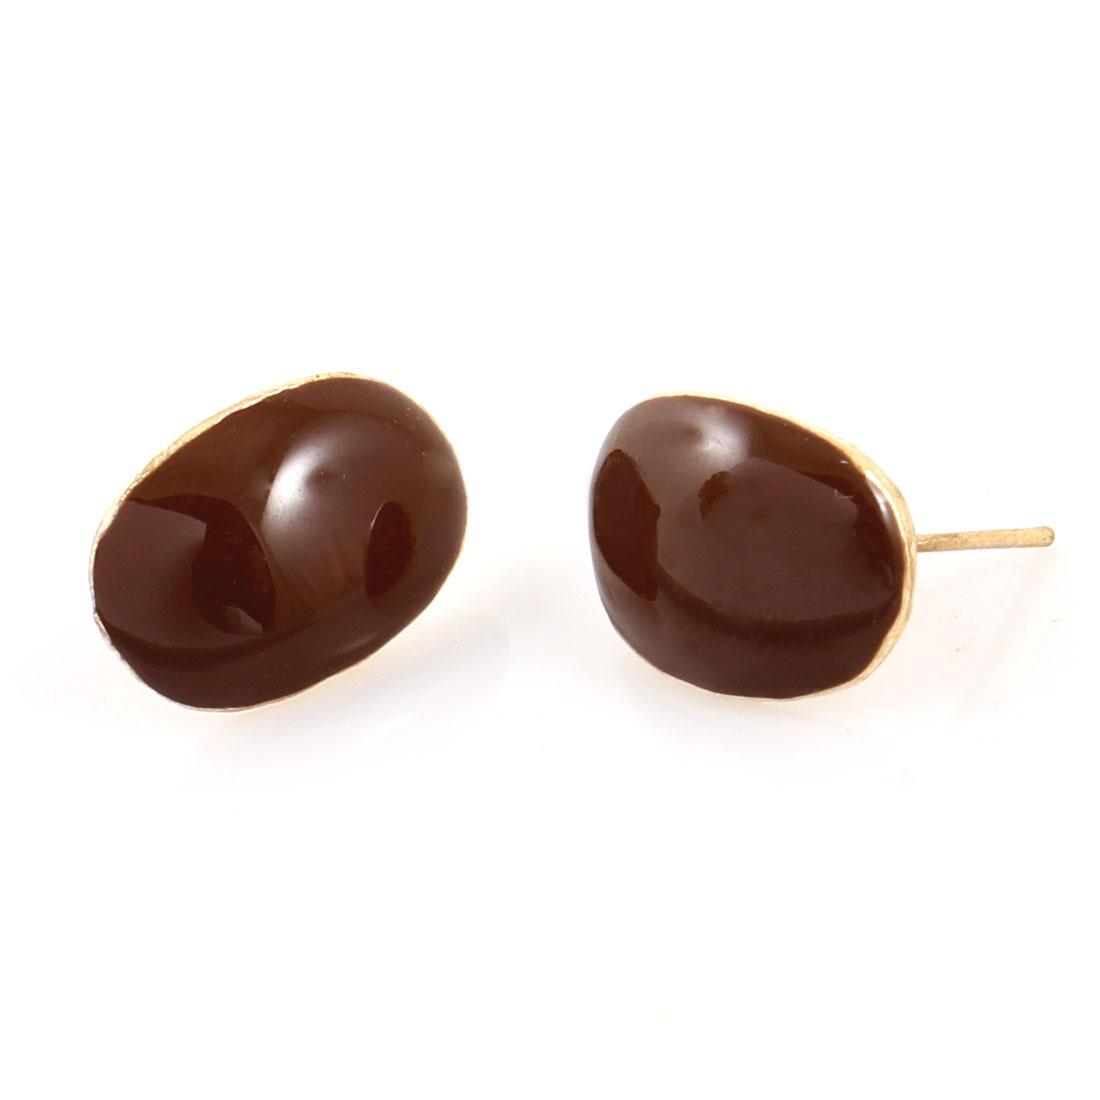 Women Ear Ornament Chocolate Color Coffee Bean Shaped Charm Stud Earrings Pair